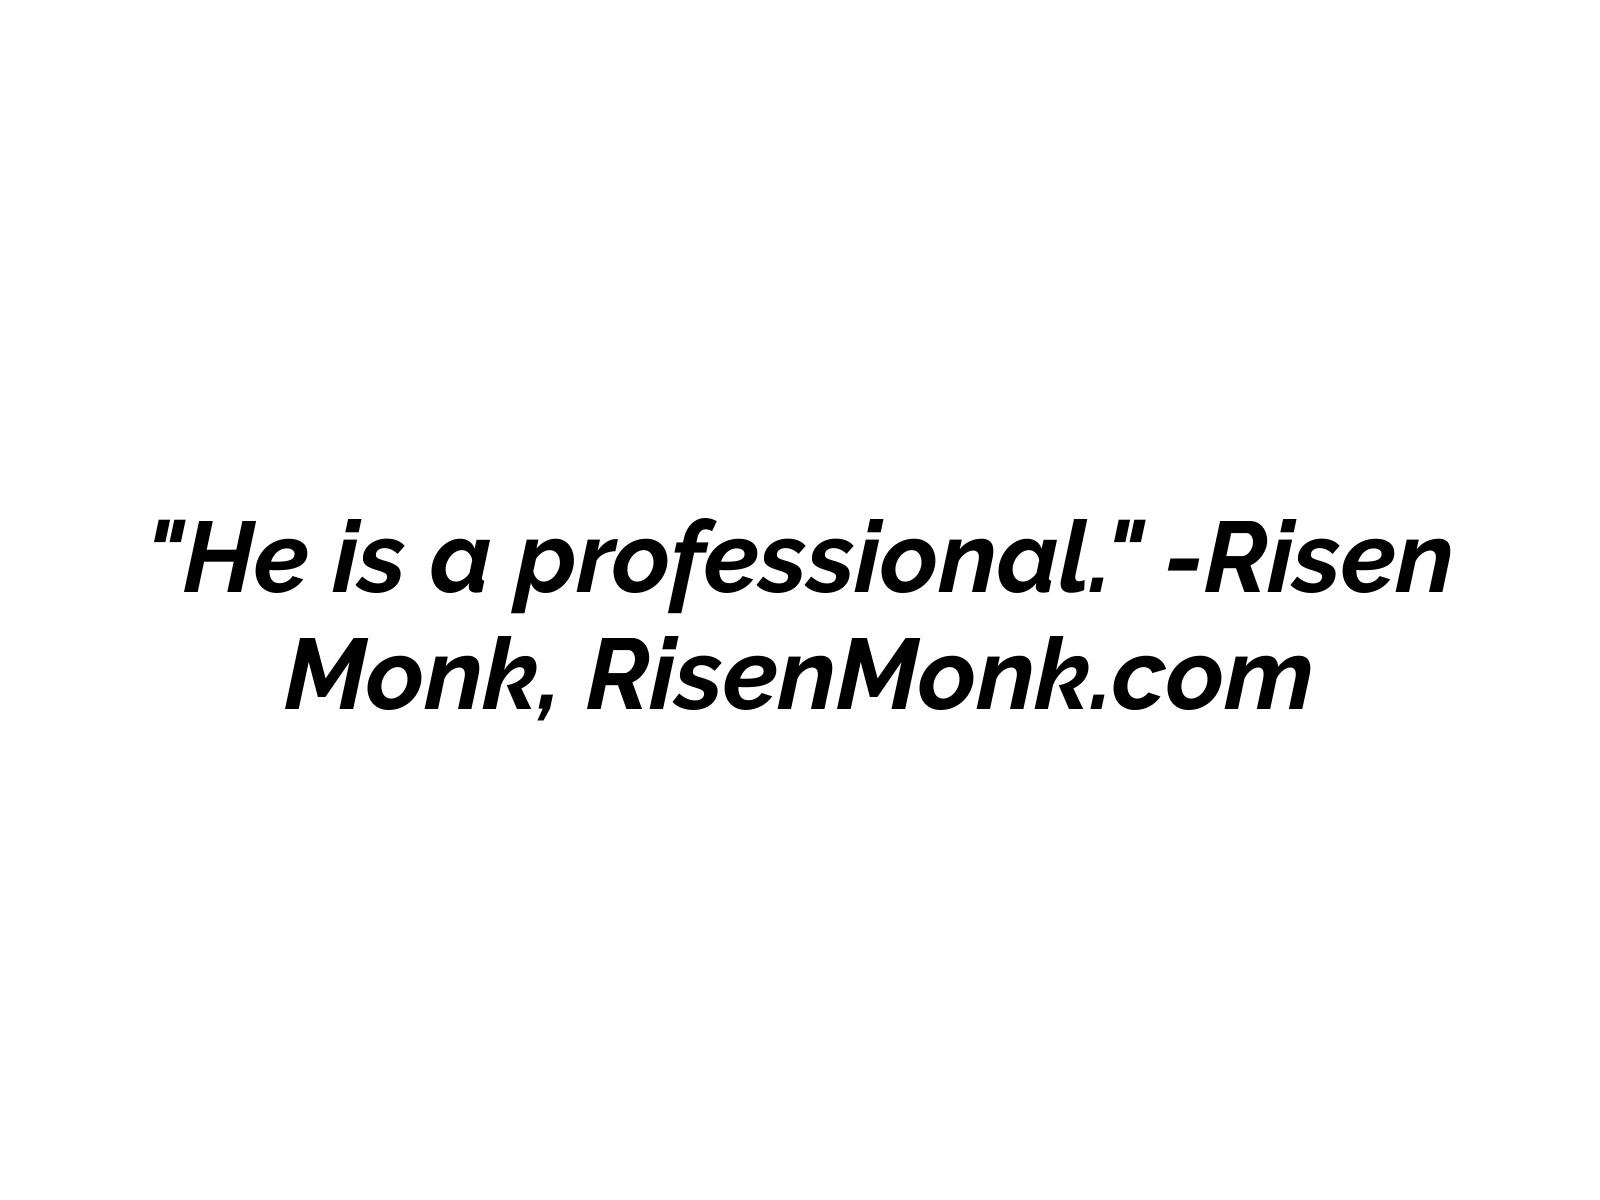 Risen Monk.jpg